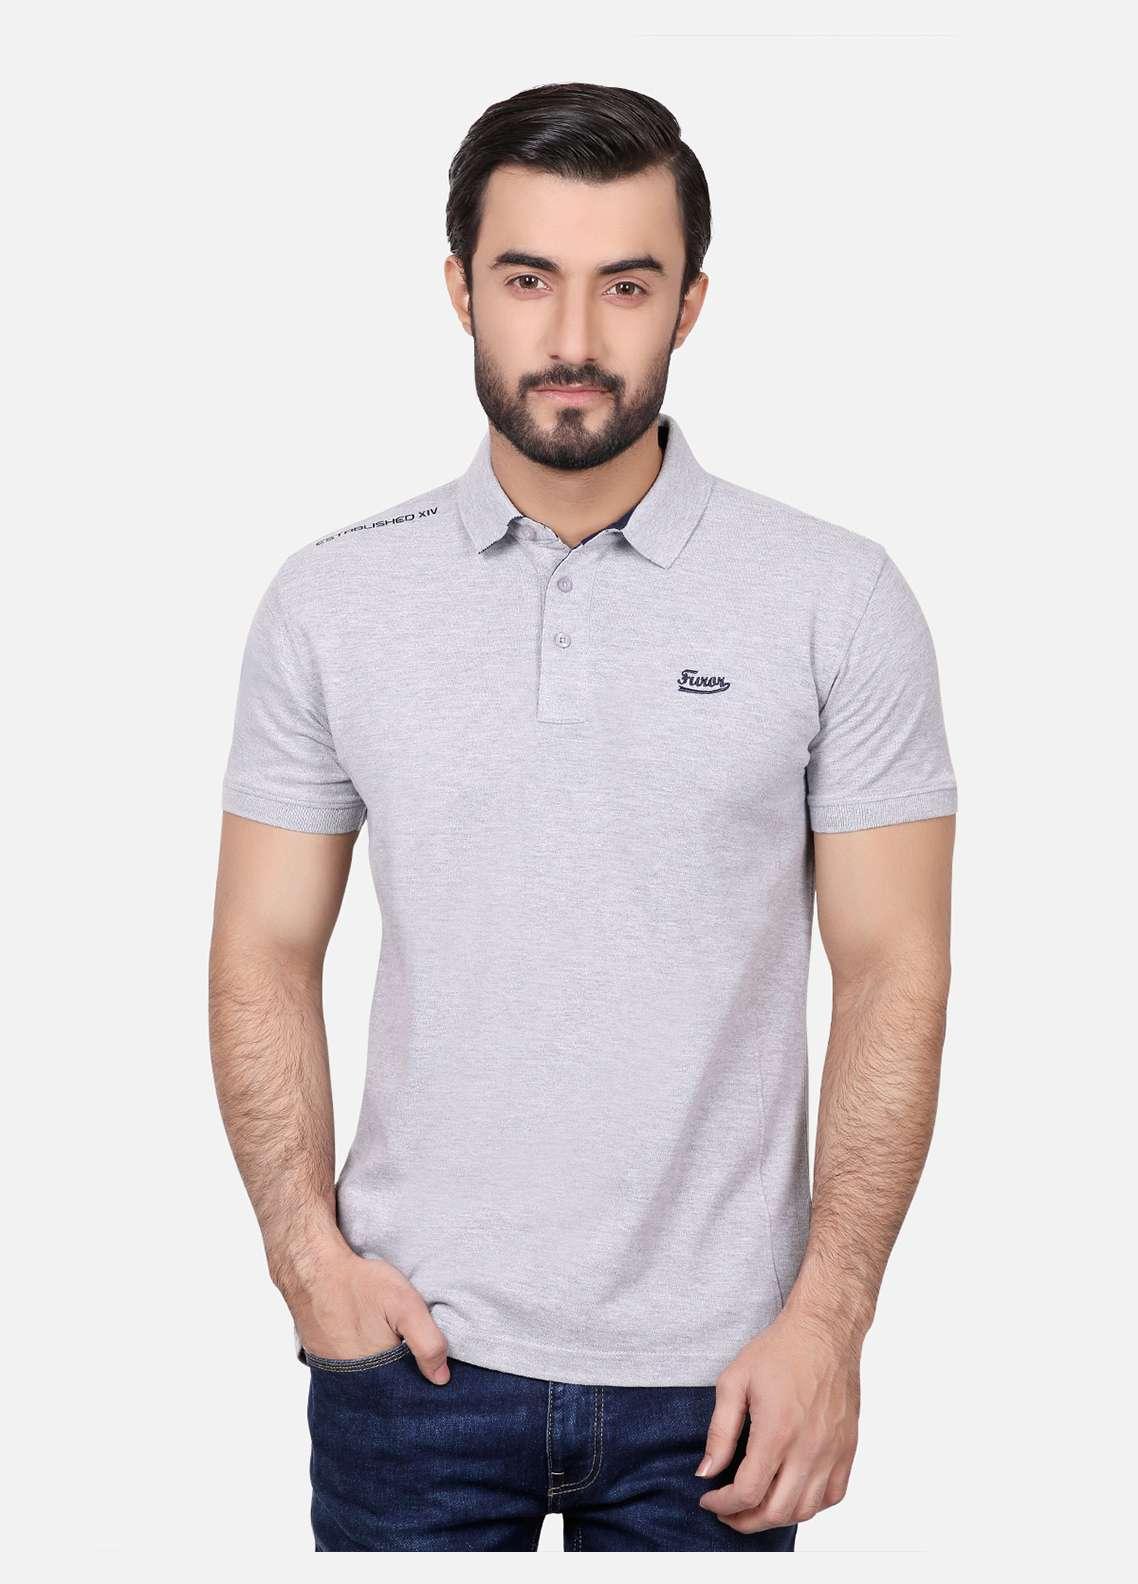 Furor Cotton Polo Men T-Shirts - Grey FRM18PS 027